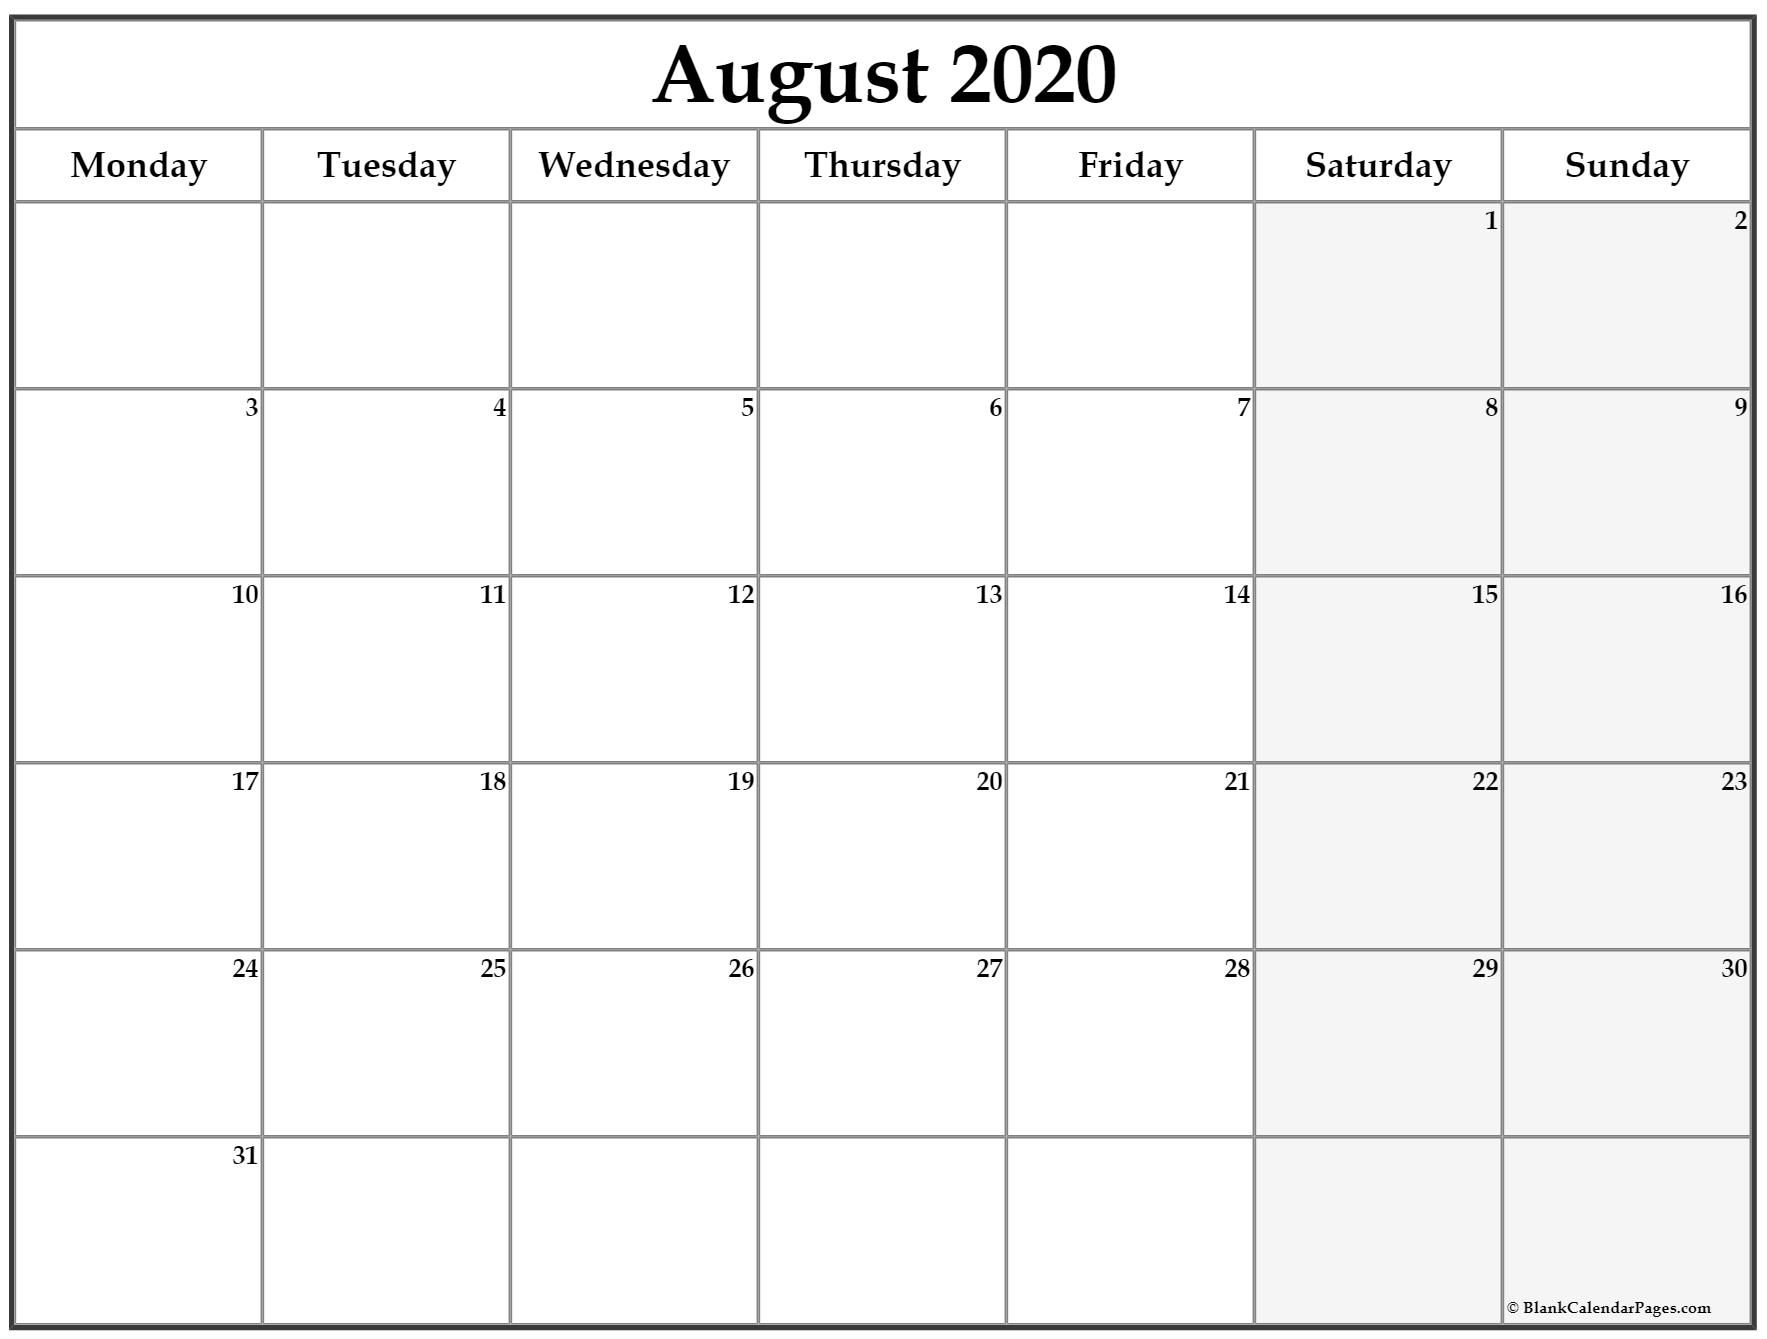 August 2020 Monday Calendar   Monday To Sunday